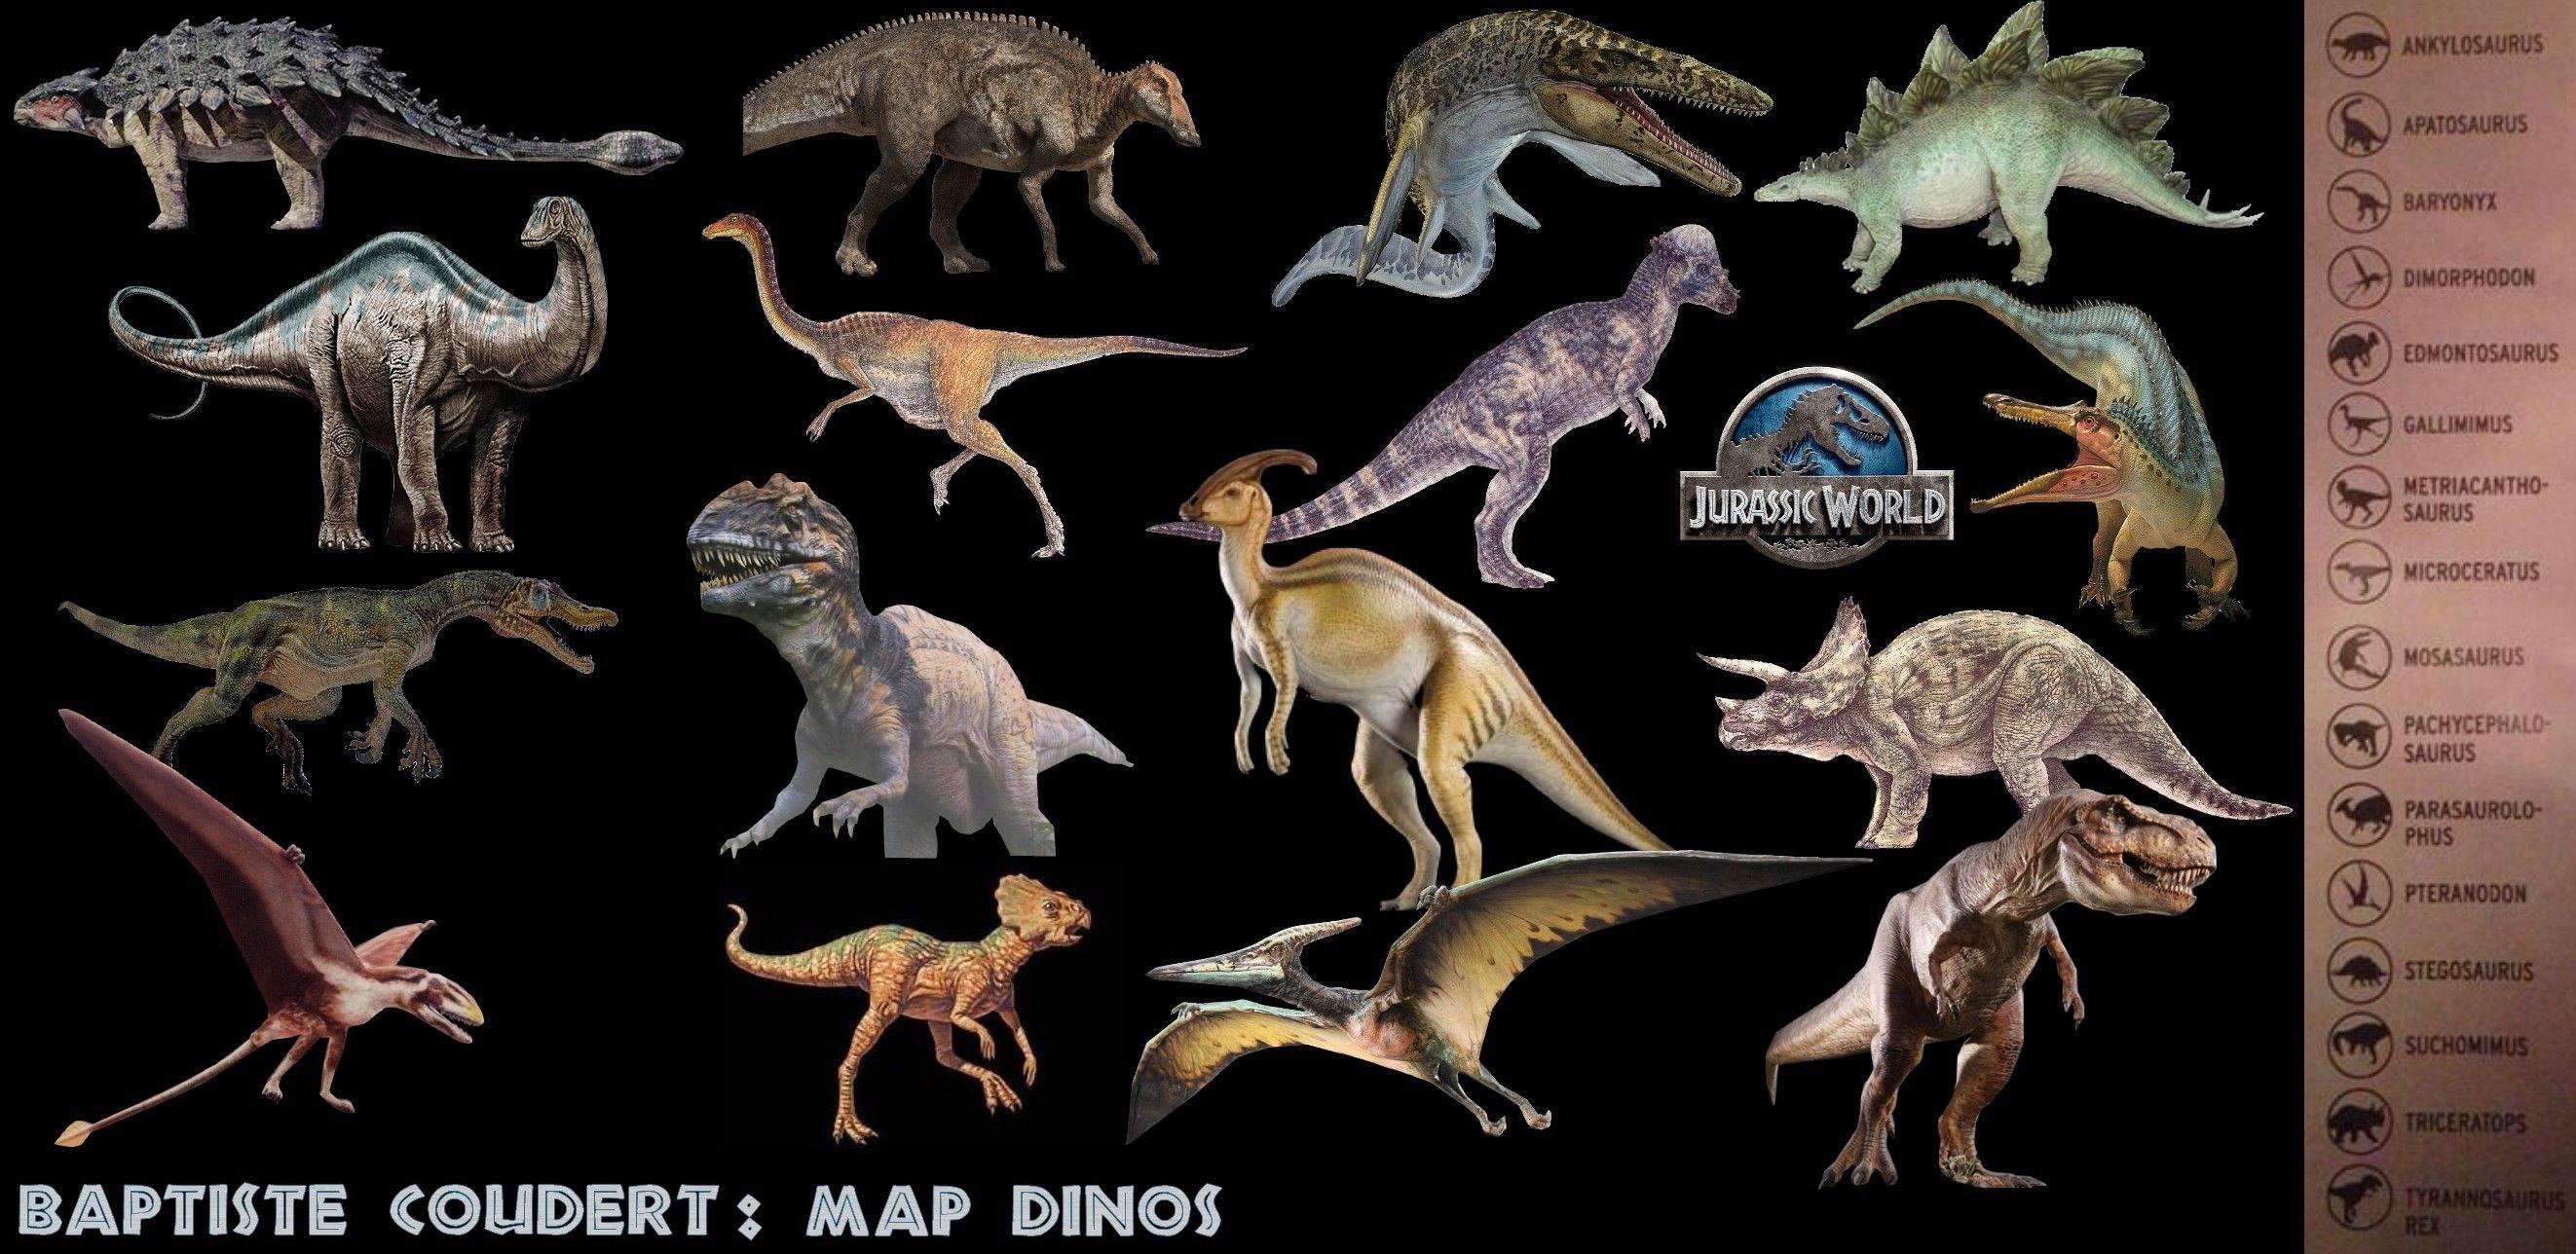 Jurassic World 2015 (Jurassic Park 4) Dinosaurs List According to ...